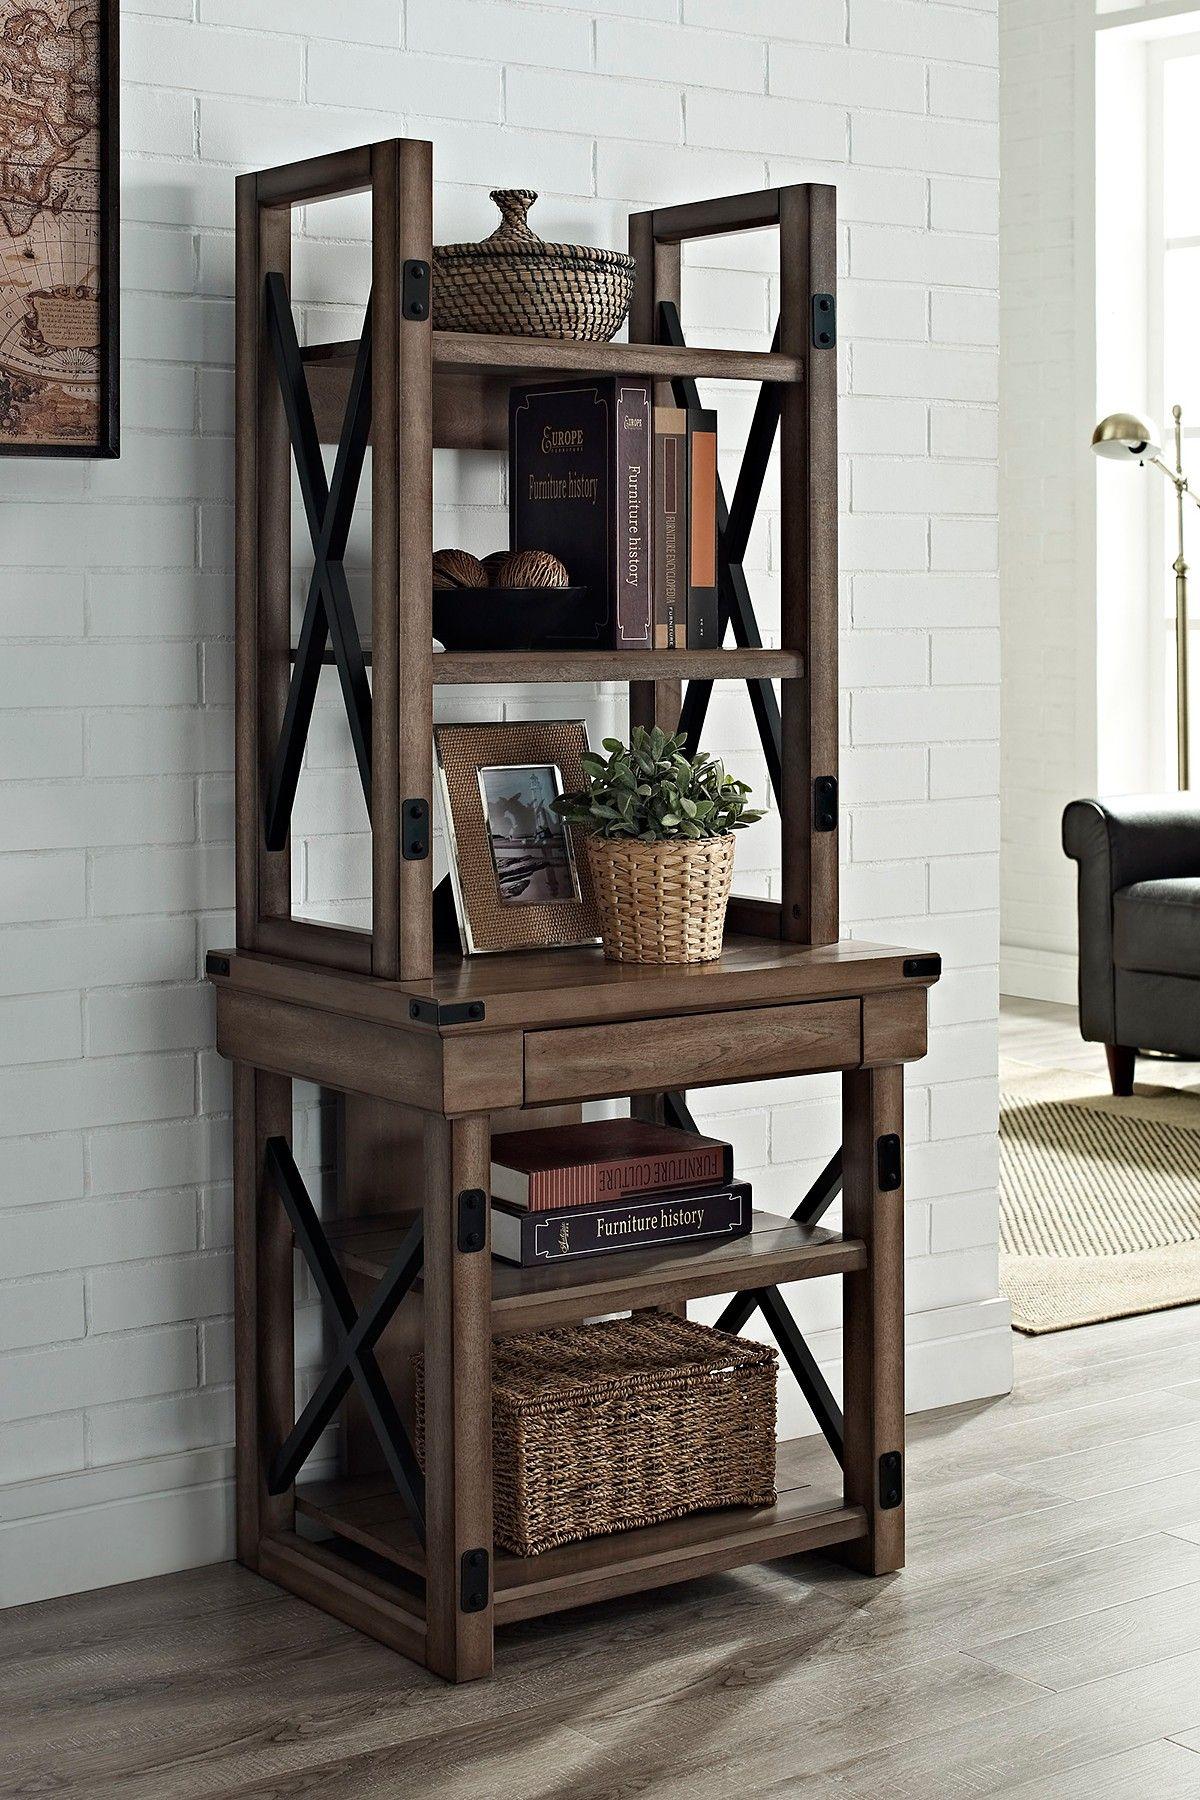 Altra furniture wildwood metal frame rustic audio pier